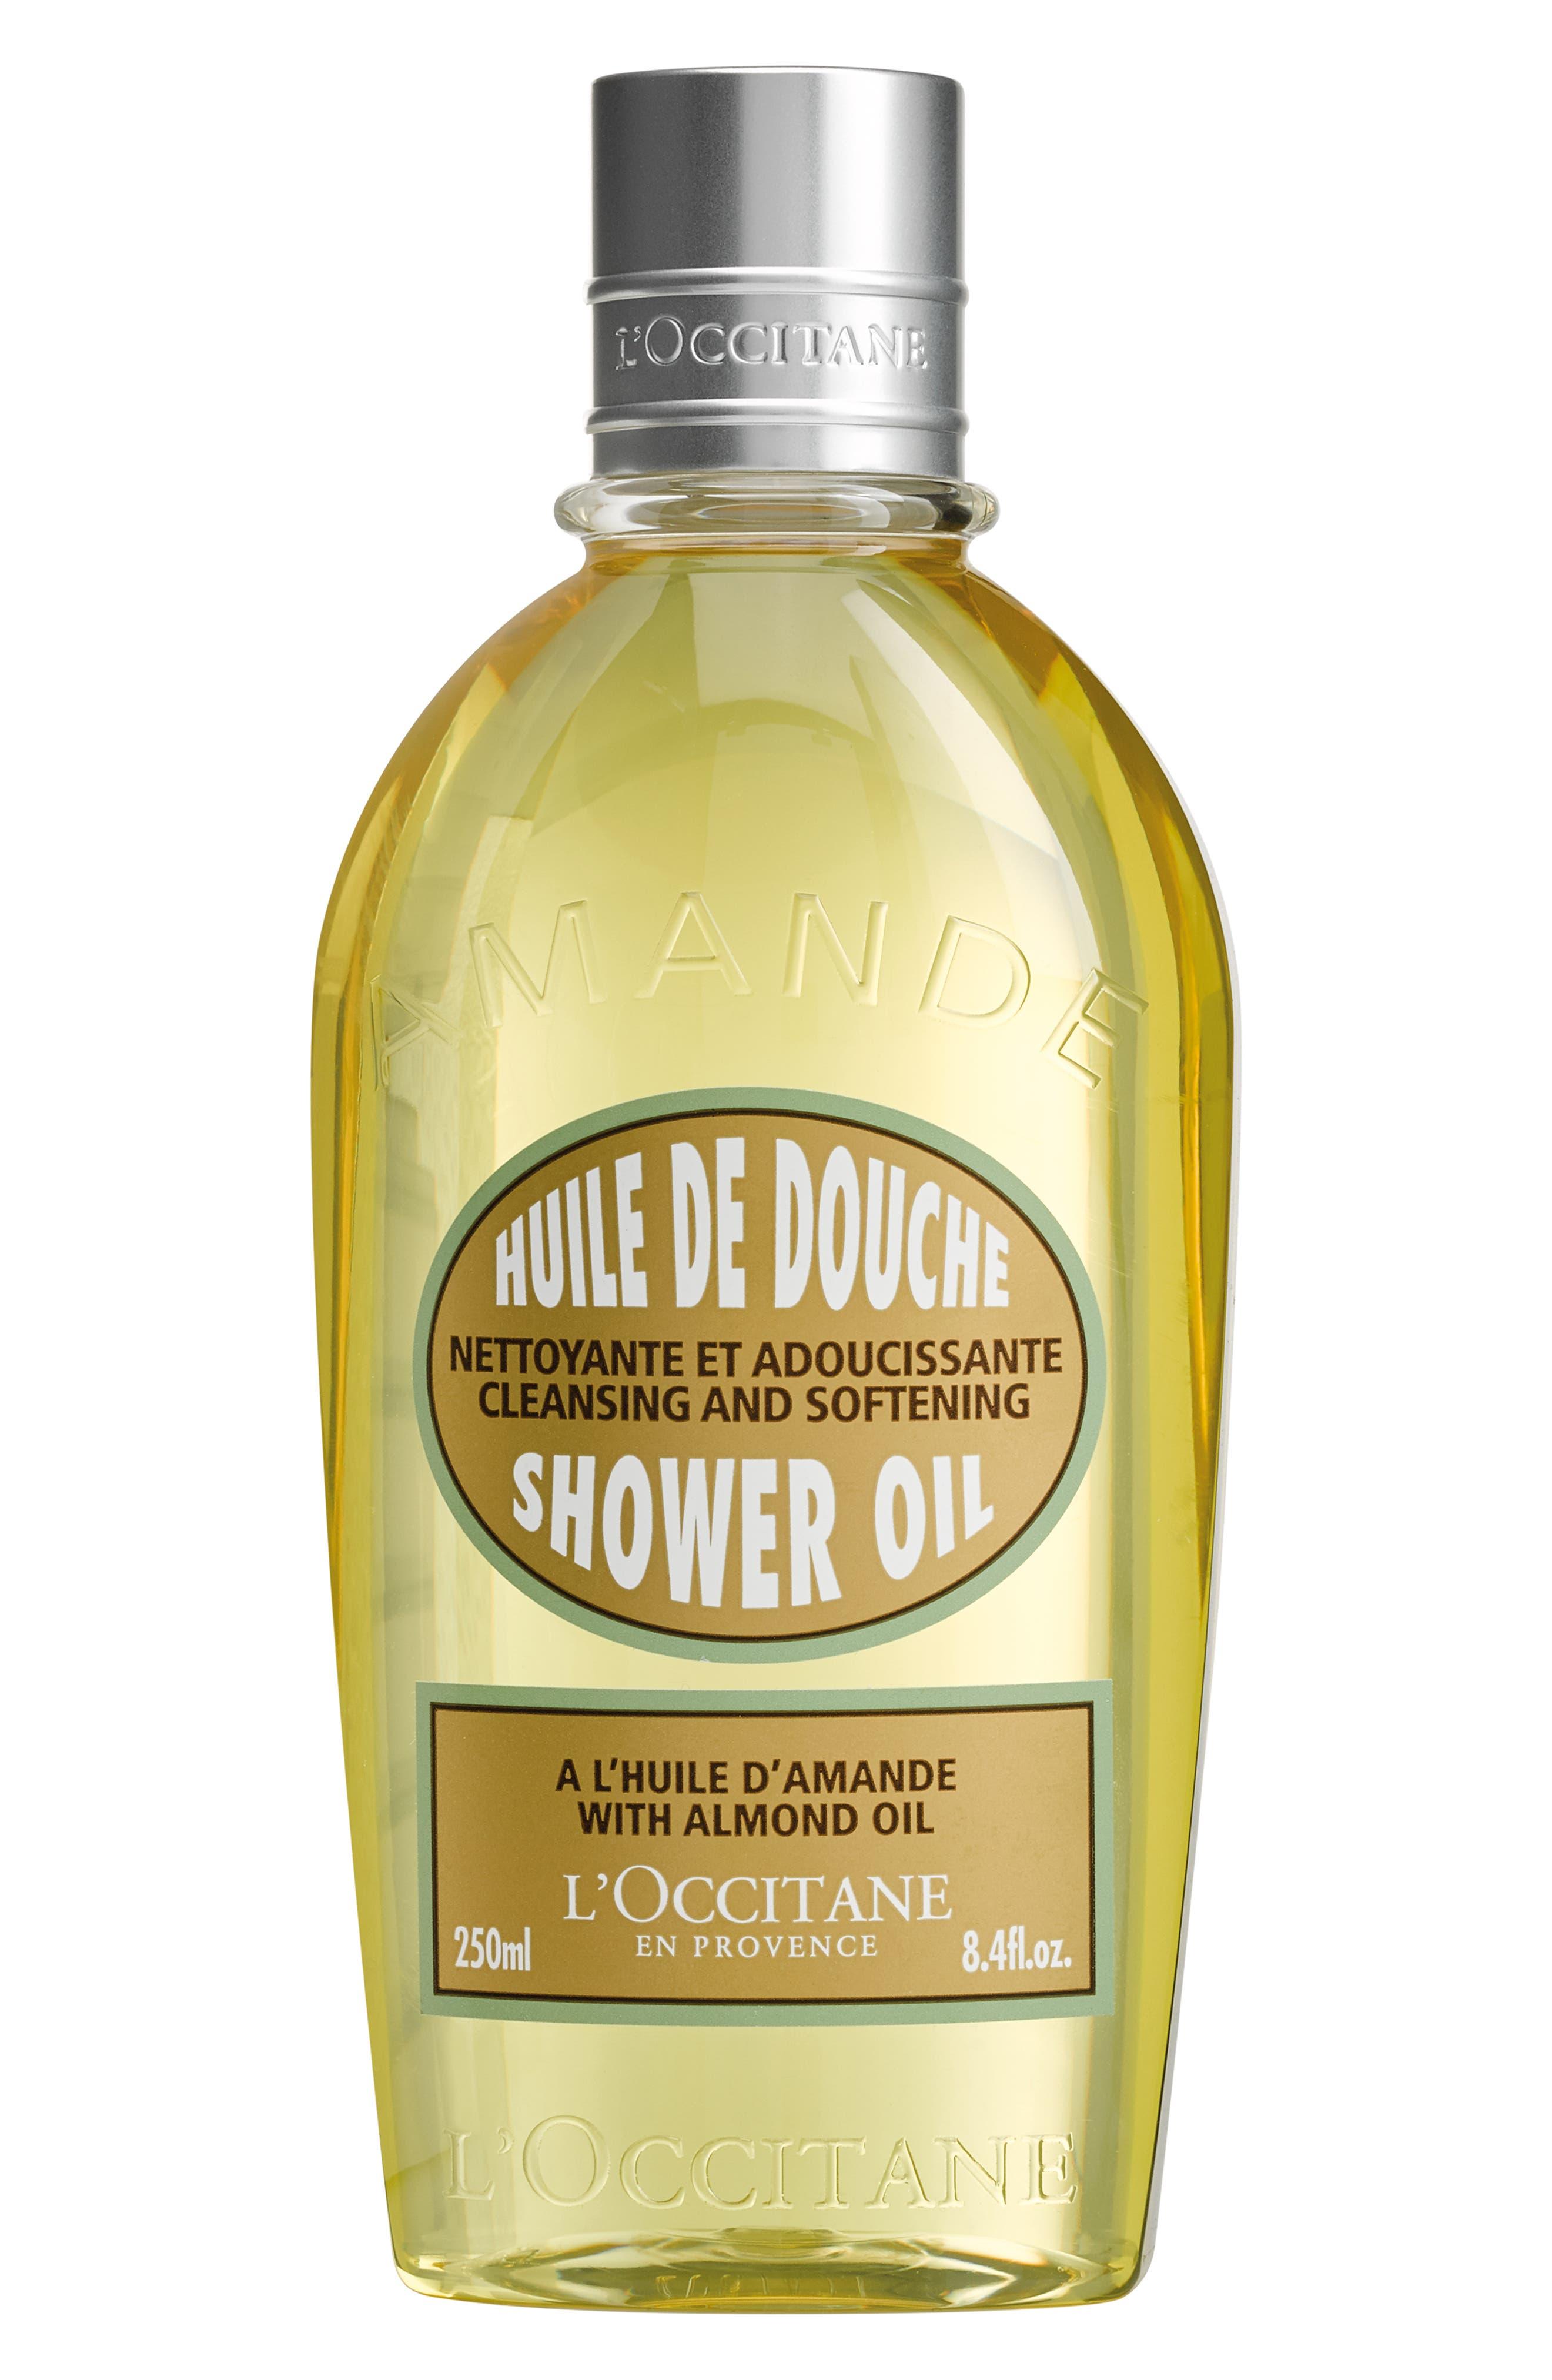 L'Occitane Almond Shower Oil, Size 8.4 oz